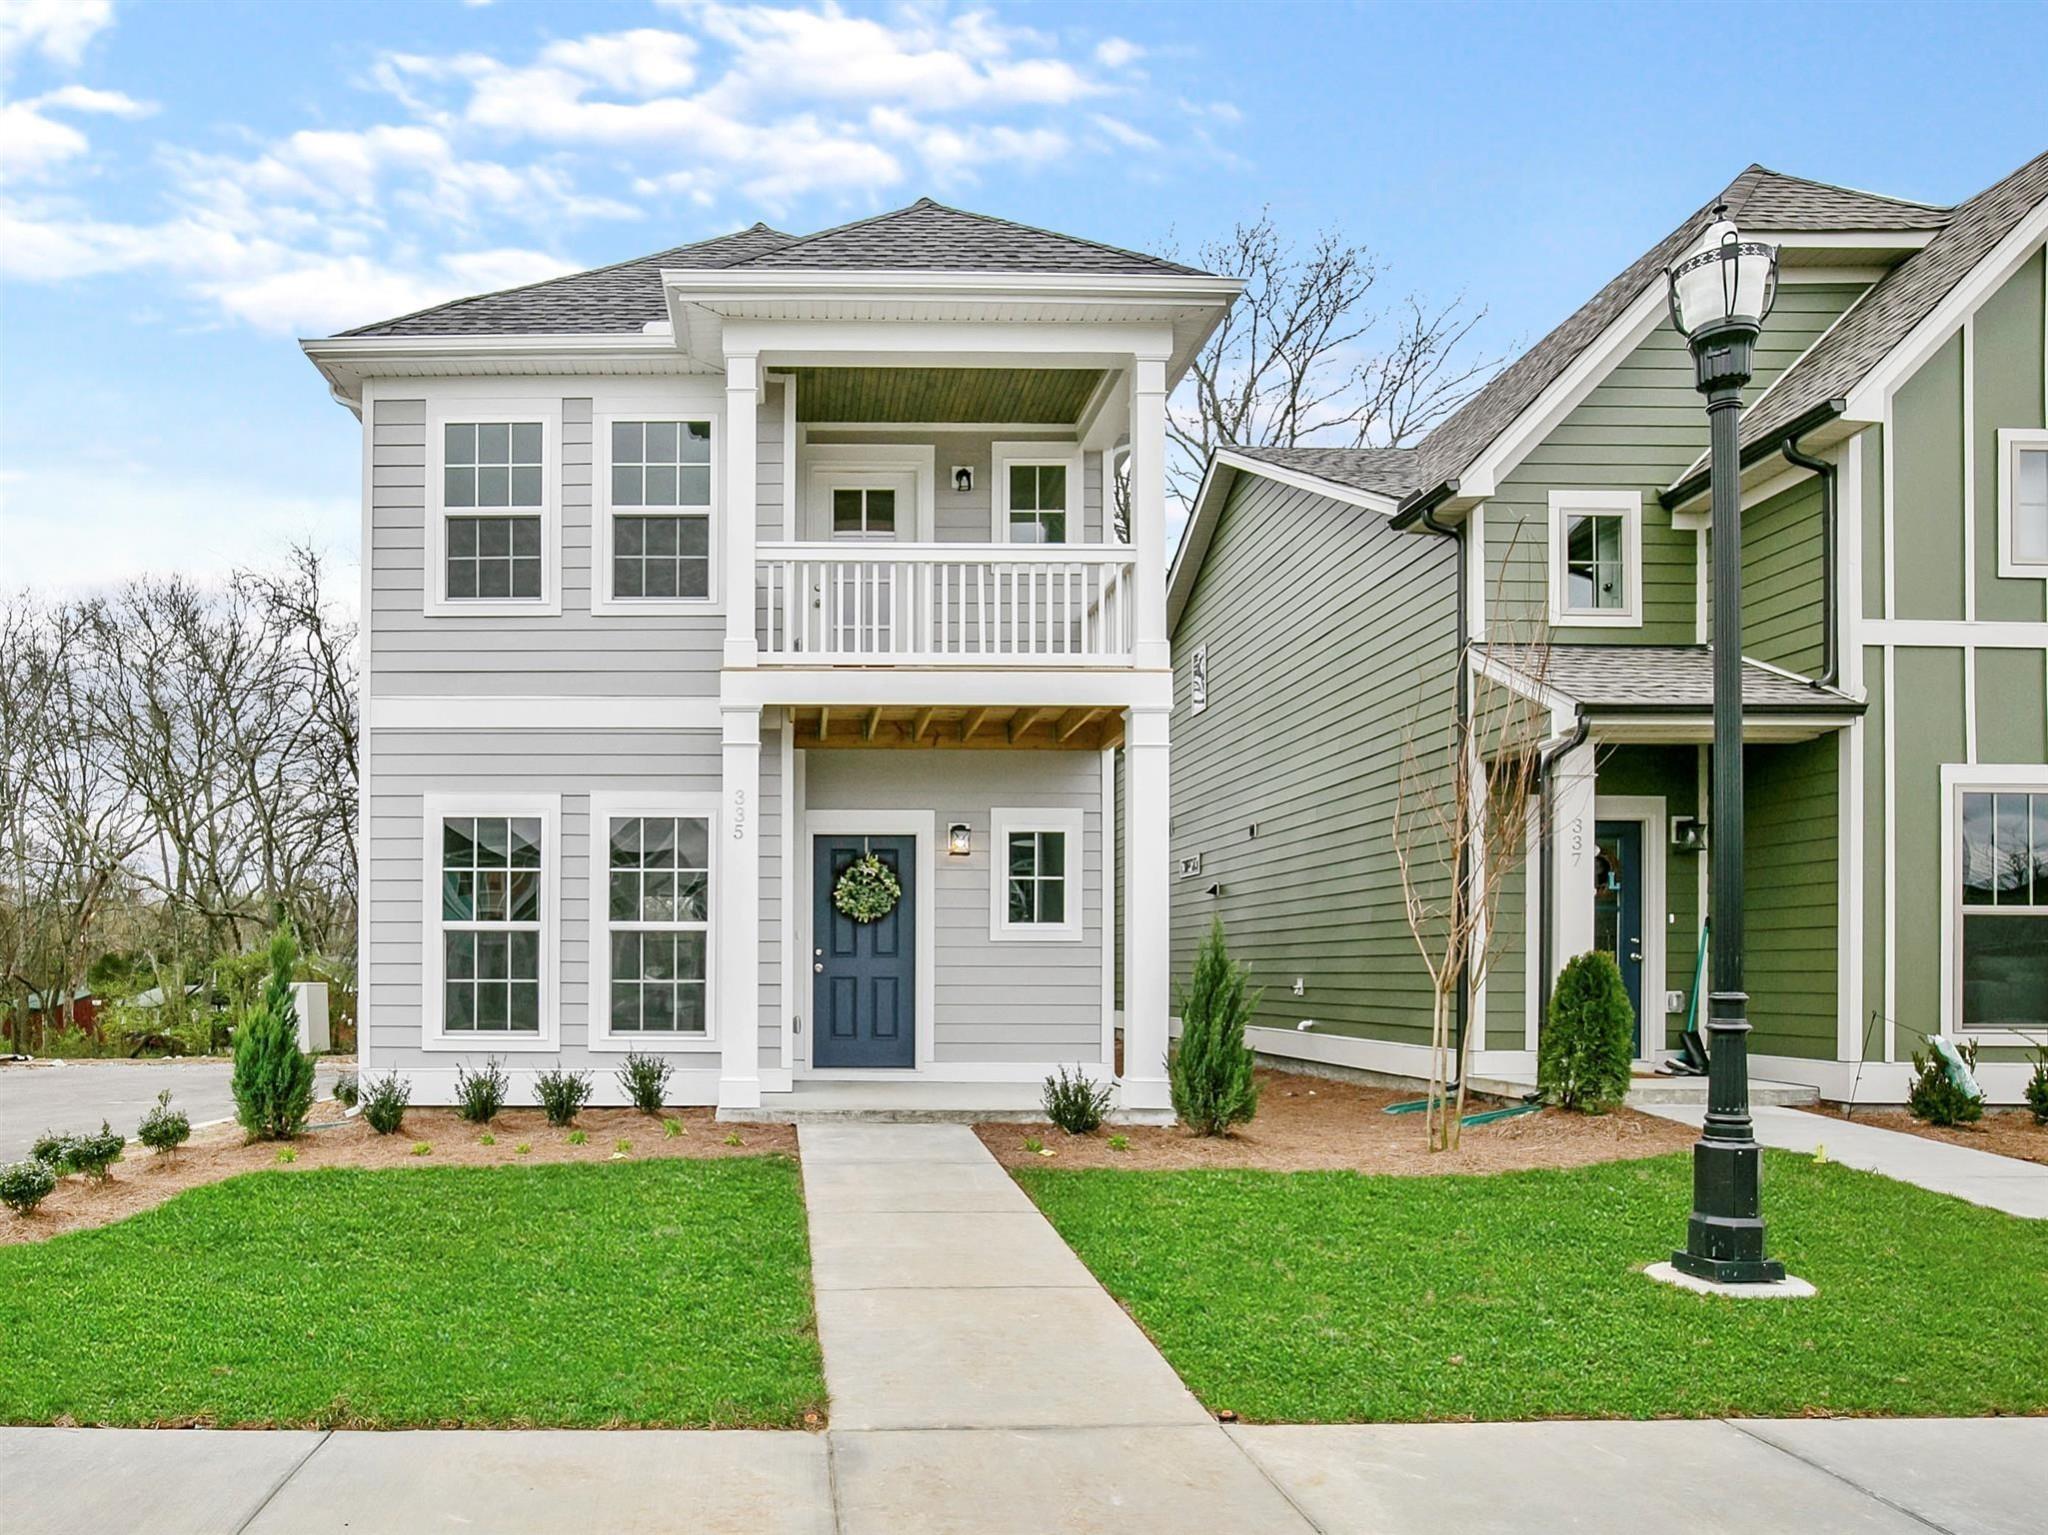 2510 Napa Valley Way, Columbia, TN 38401 - Columbia, TN real estate listing